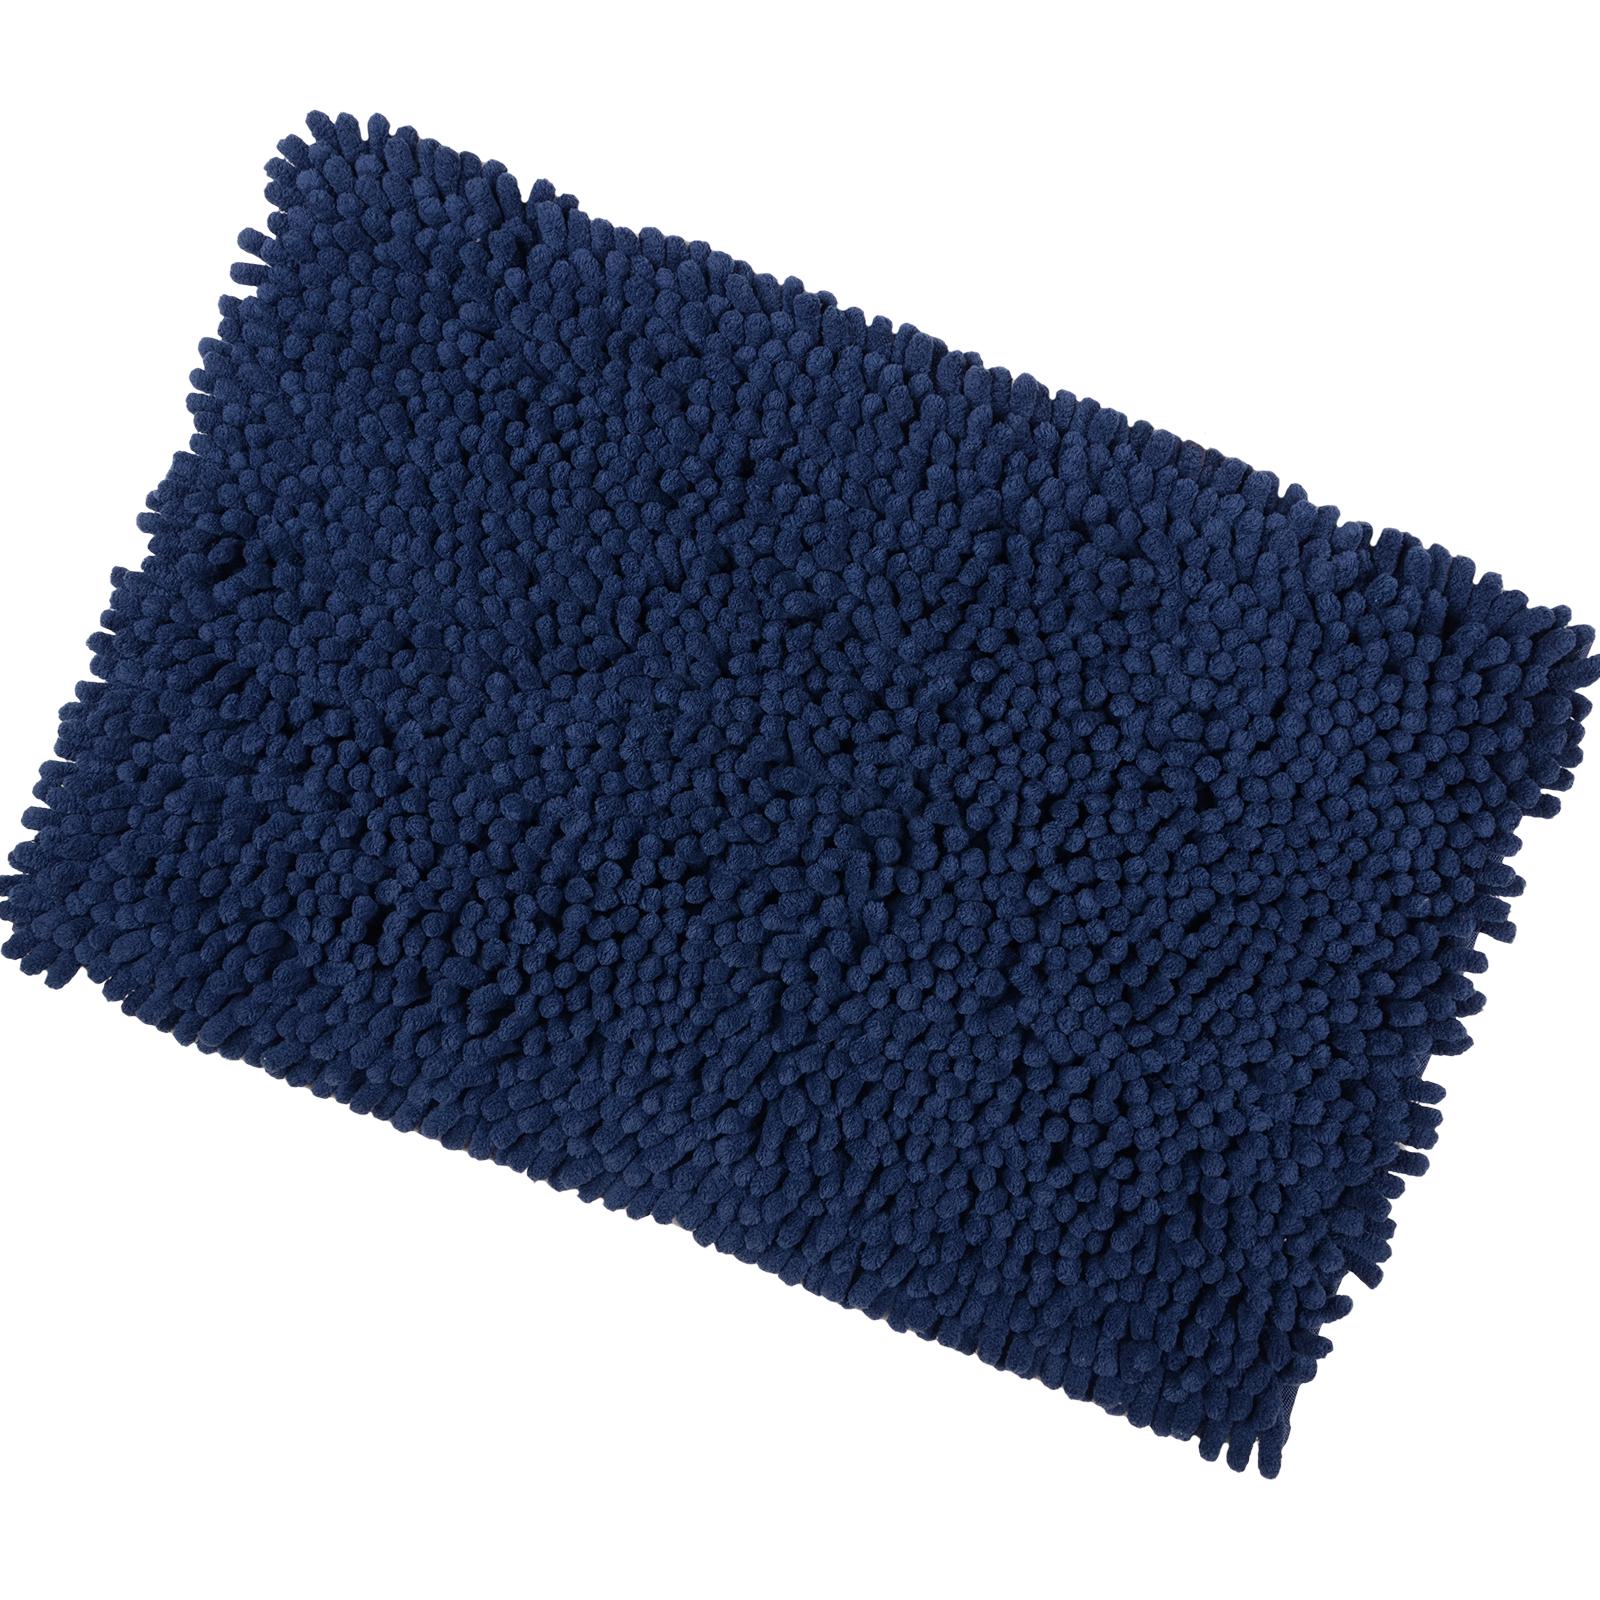 Luxury Microfibre Shaggy Bath Mat With Anti-Slip Backing Bathroom ...